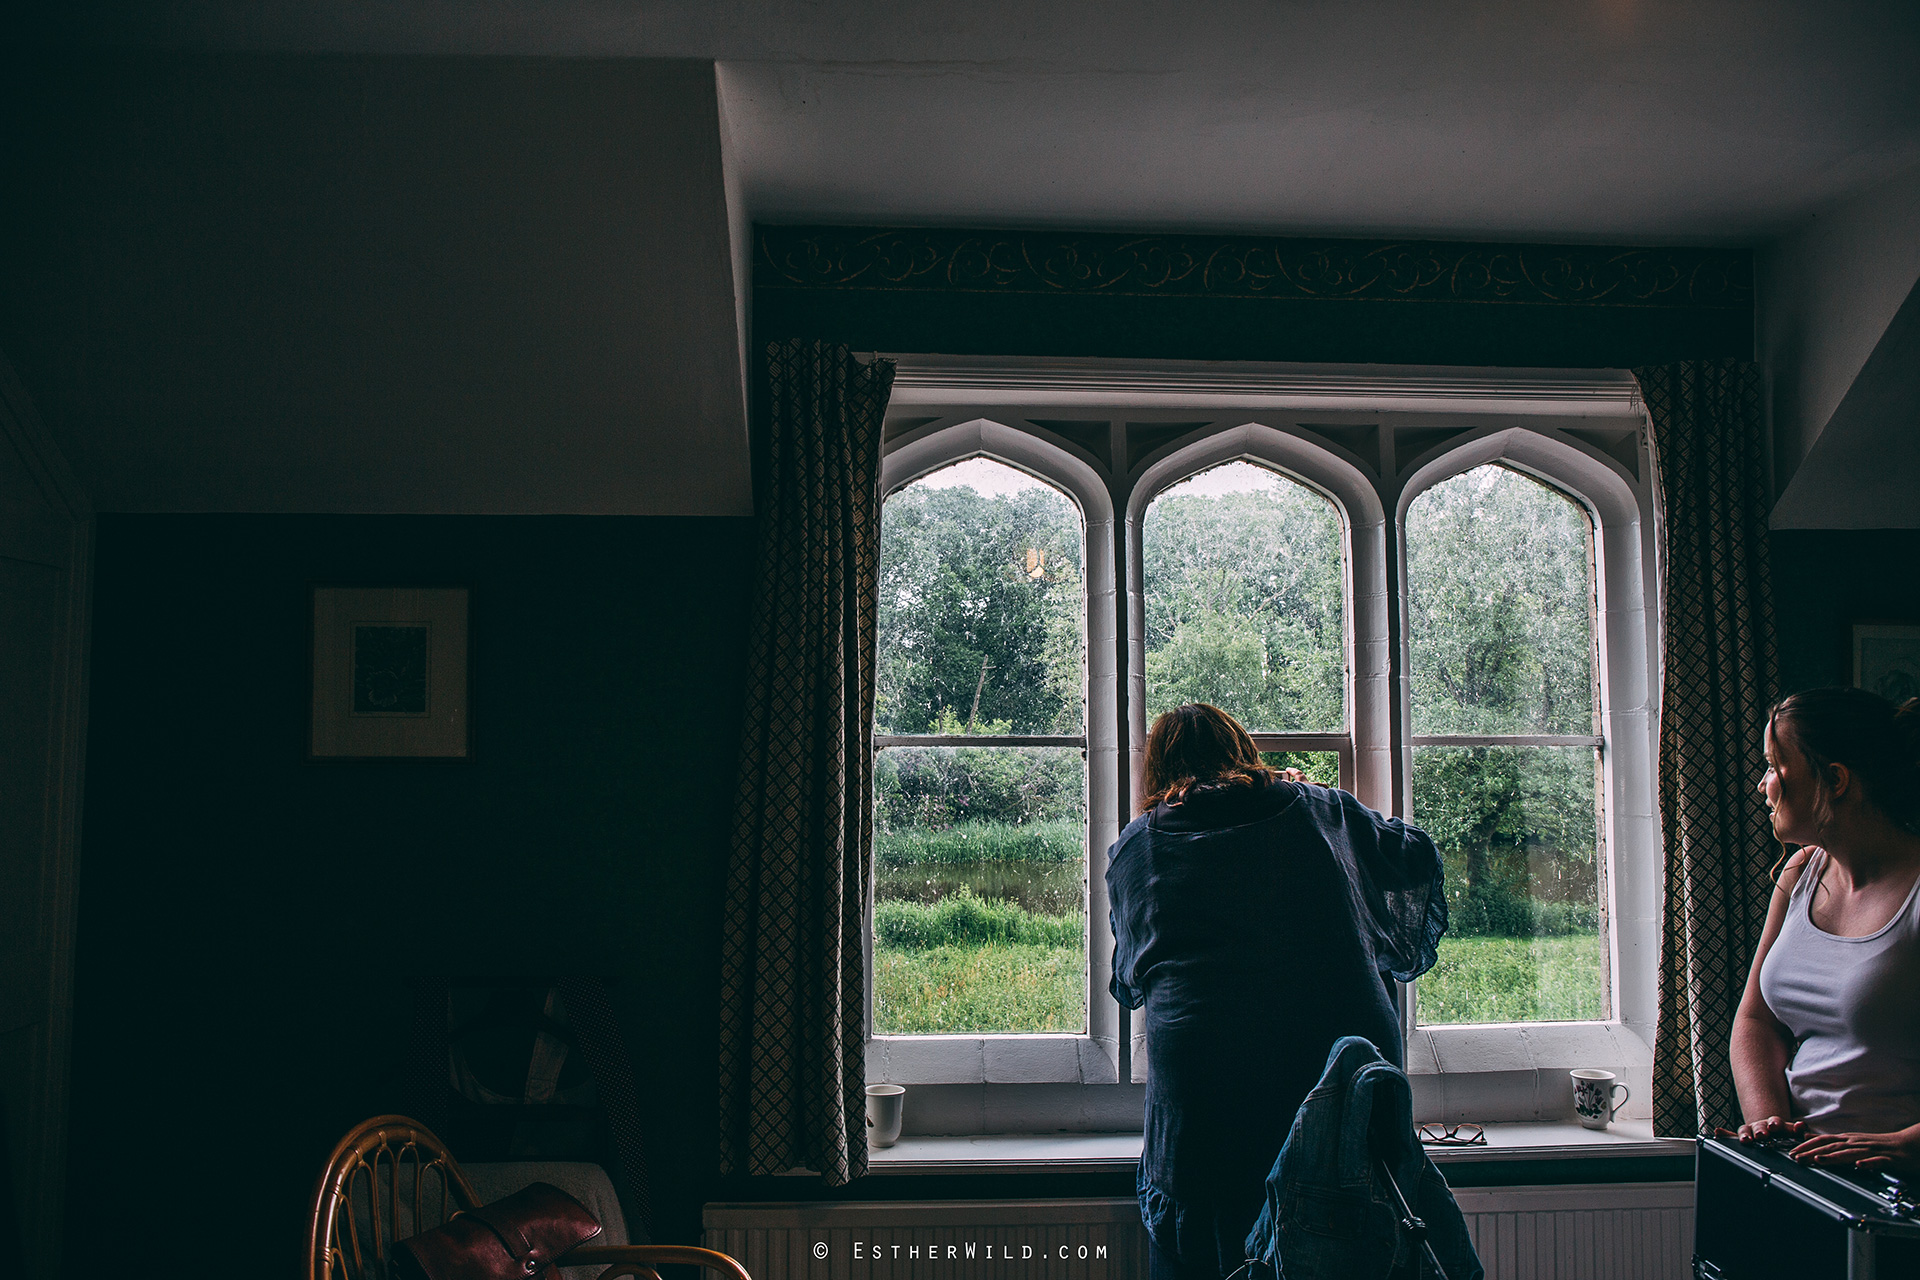 Norfolk_Wedding_Photographer_Mannington_Hall_Country_Esther_Wild_9777.jpg